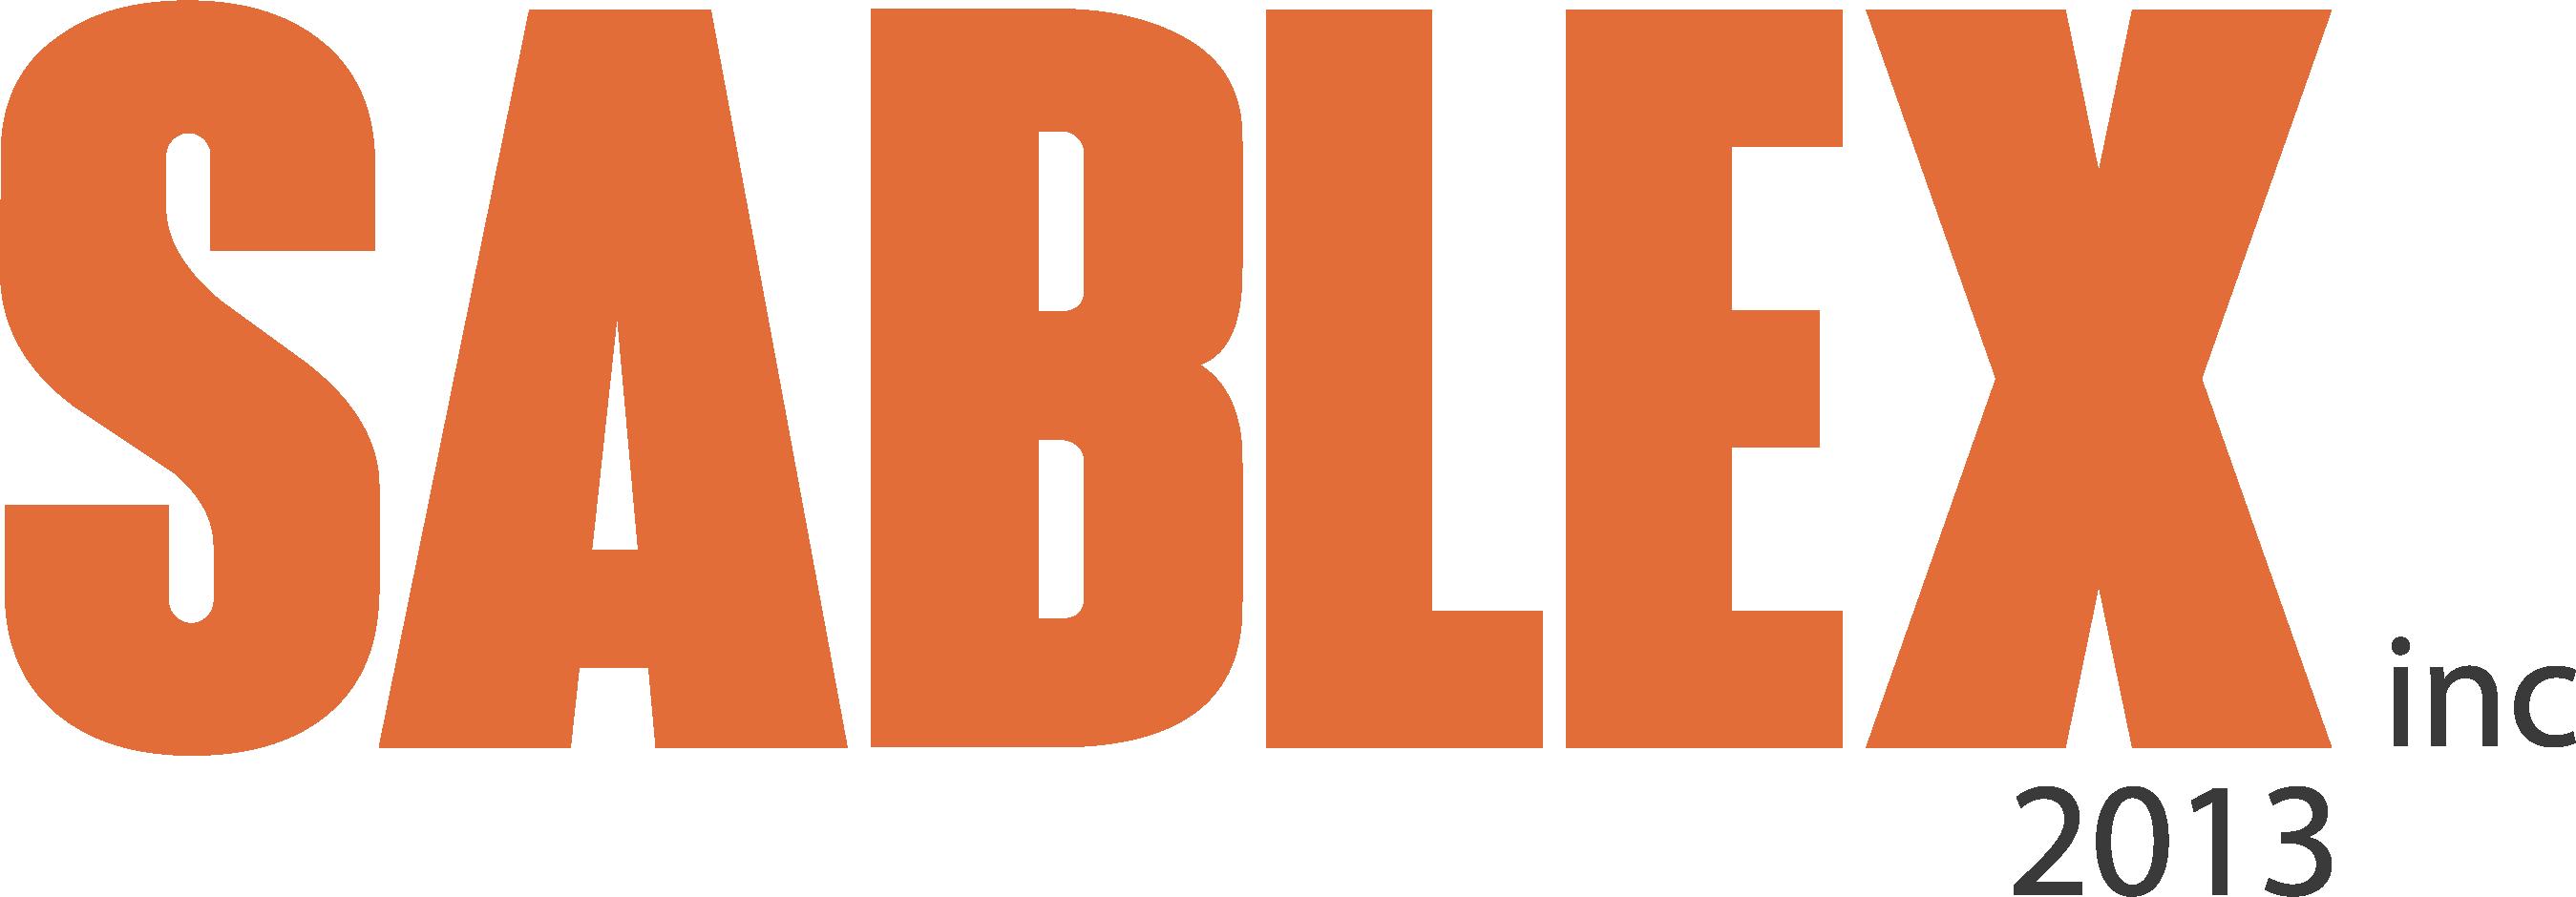 Sablex (2013) inc